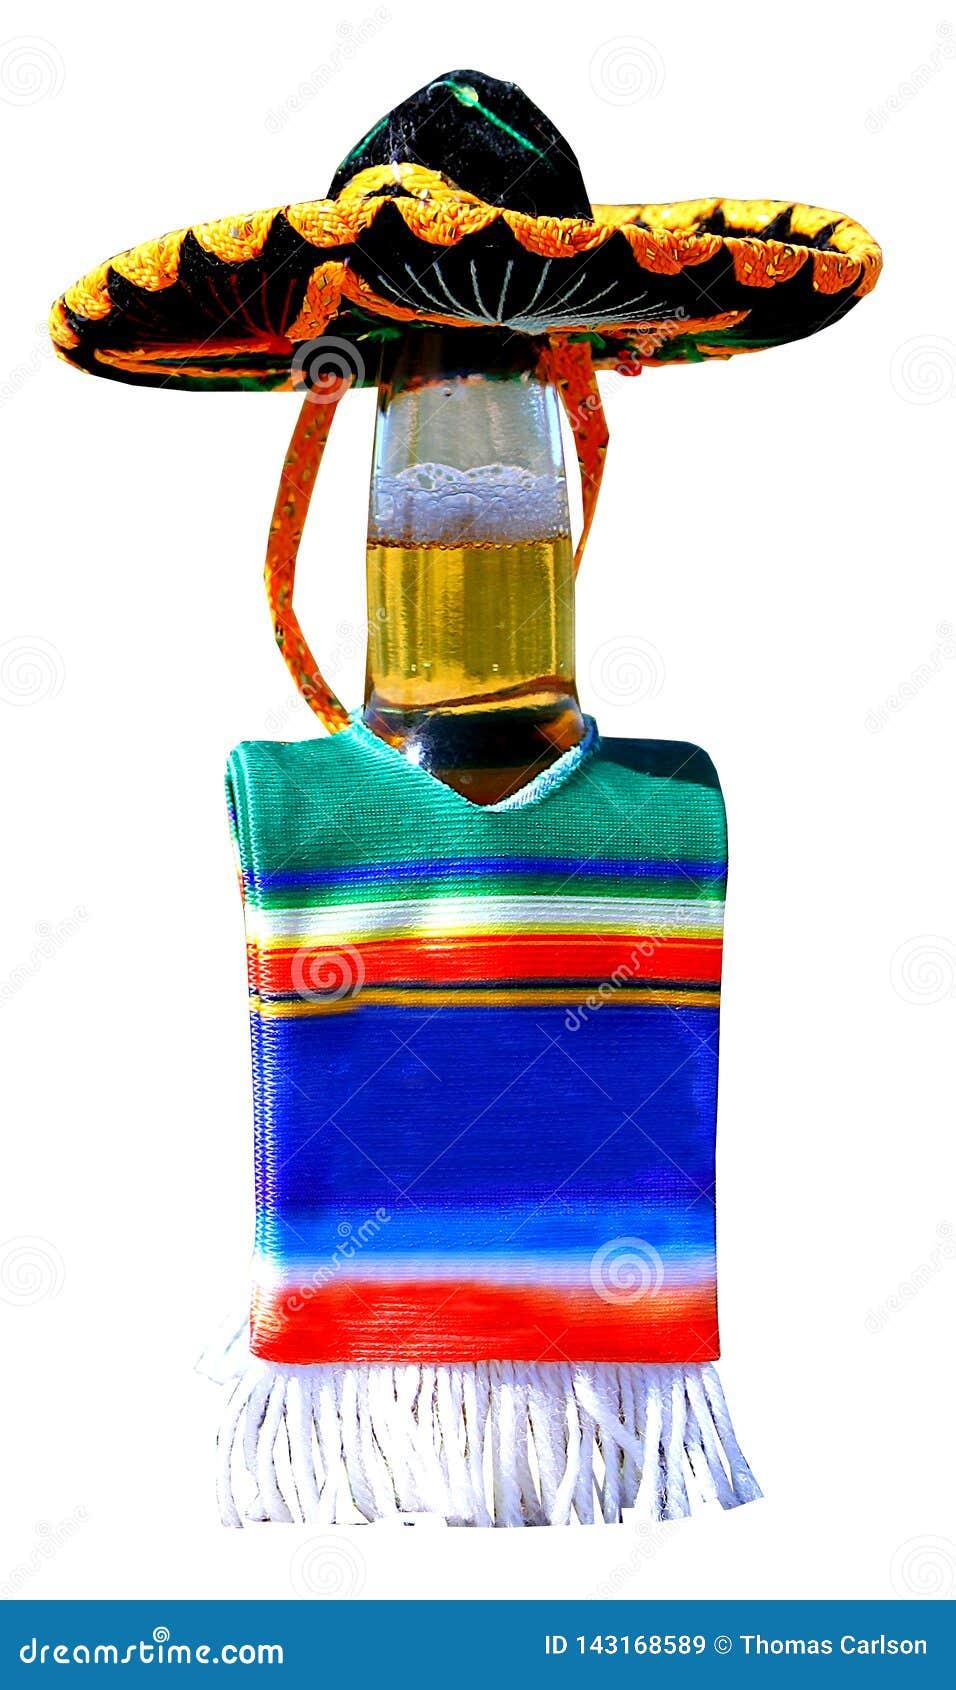 Beer bottle dressed up to celebrate Cinco de Mayo.